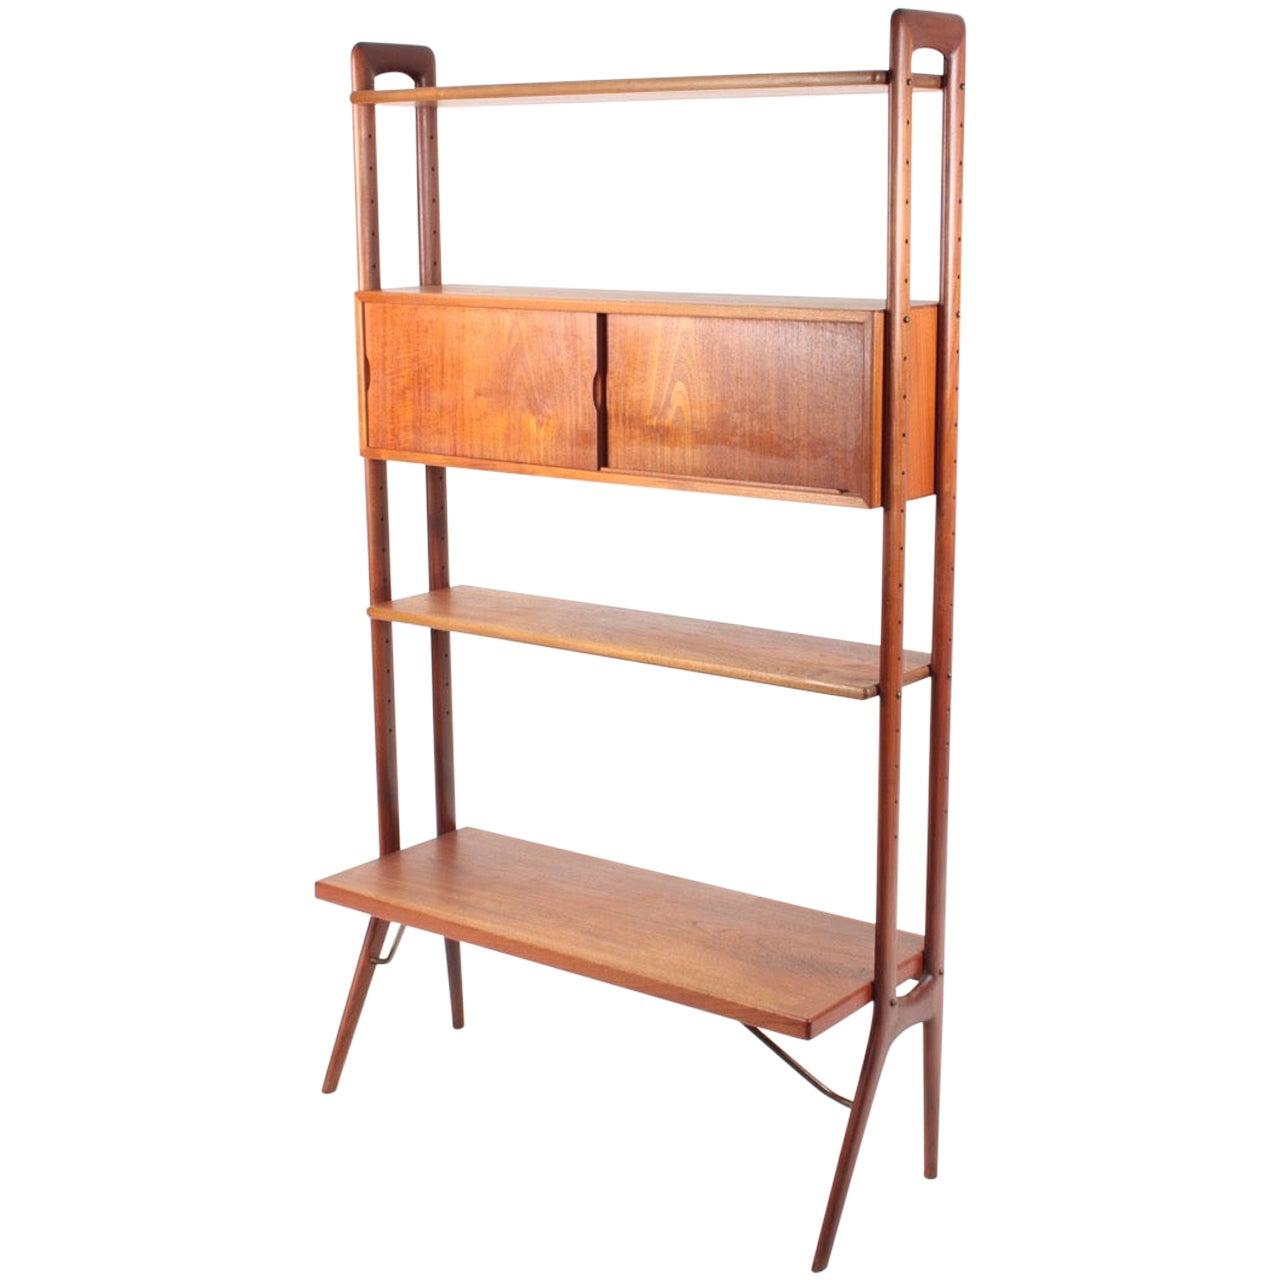 Midcentury Freestanding Bookcase in Teak by Kurt Østervig, 1960s